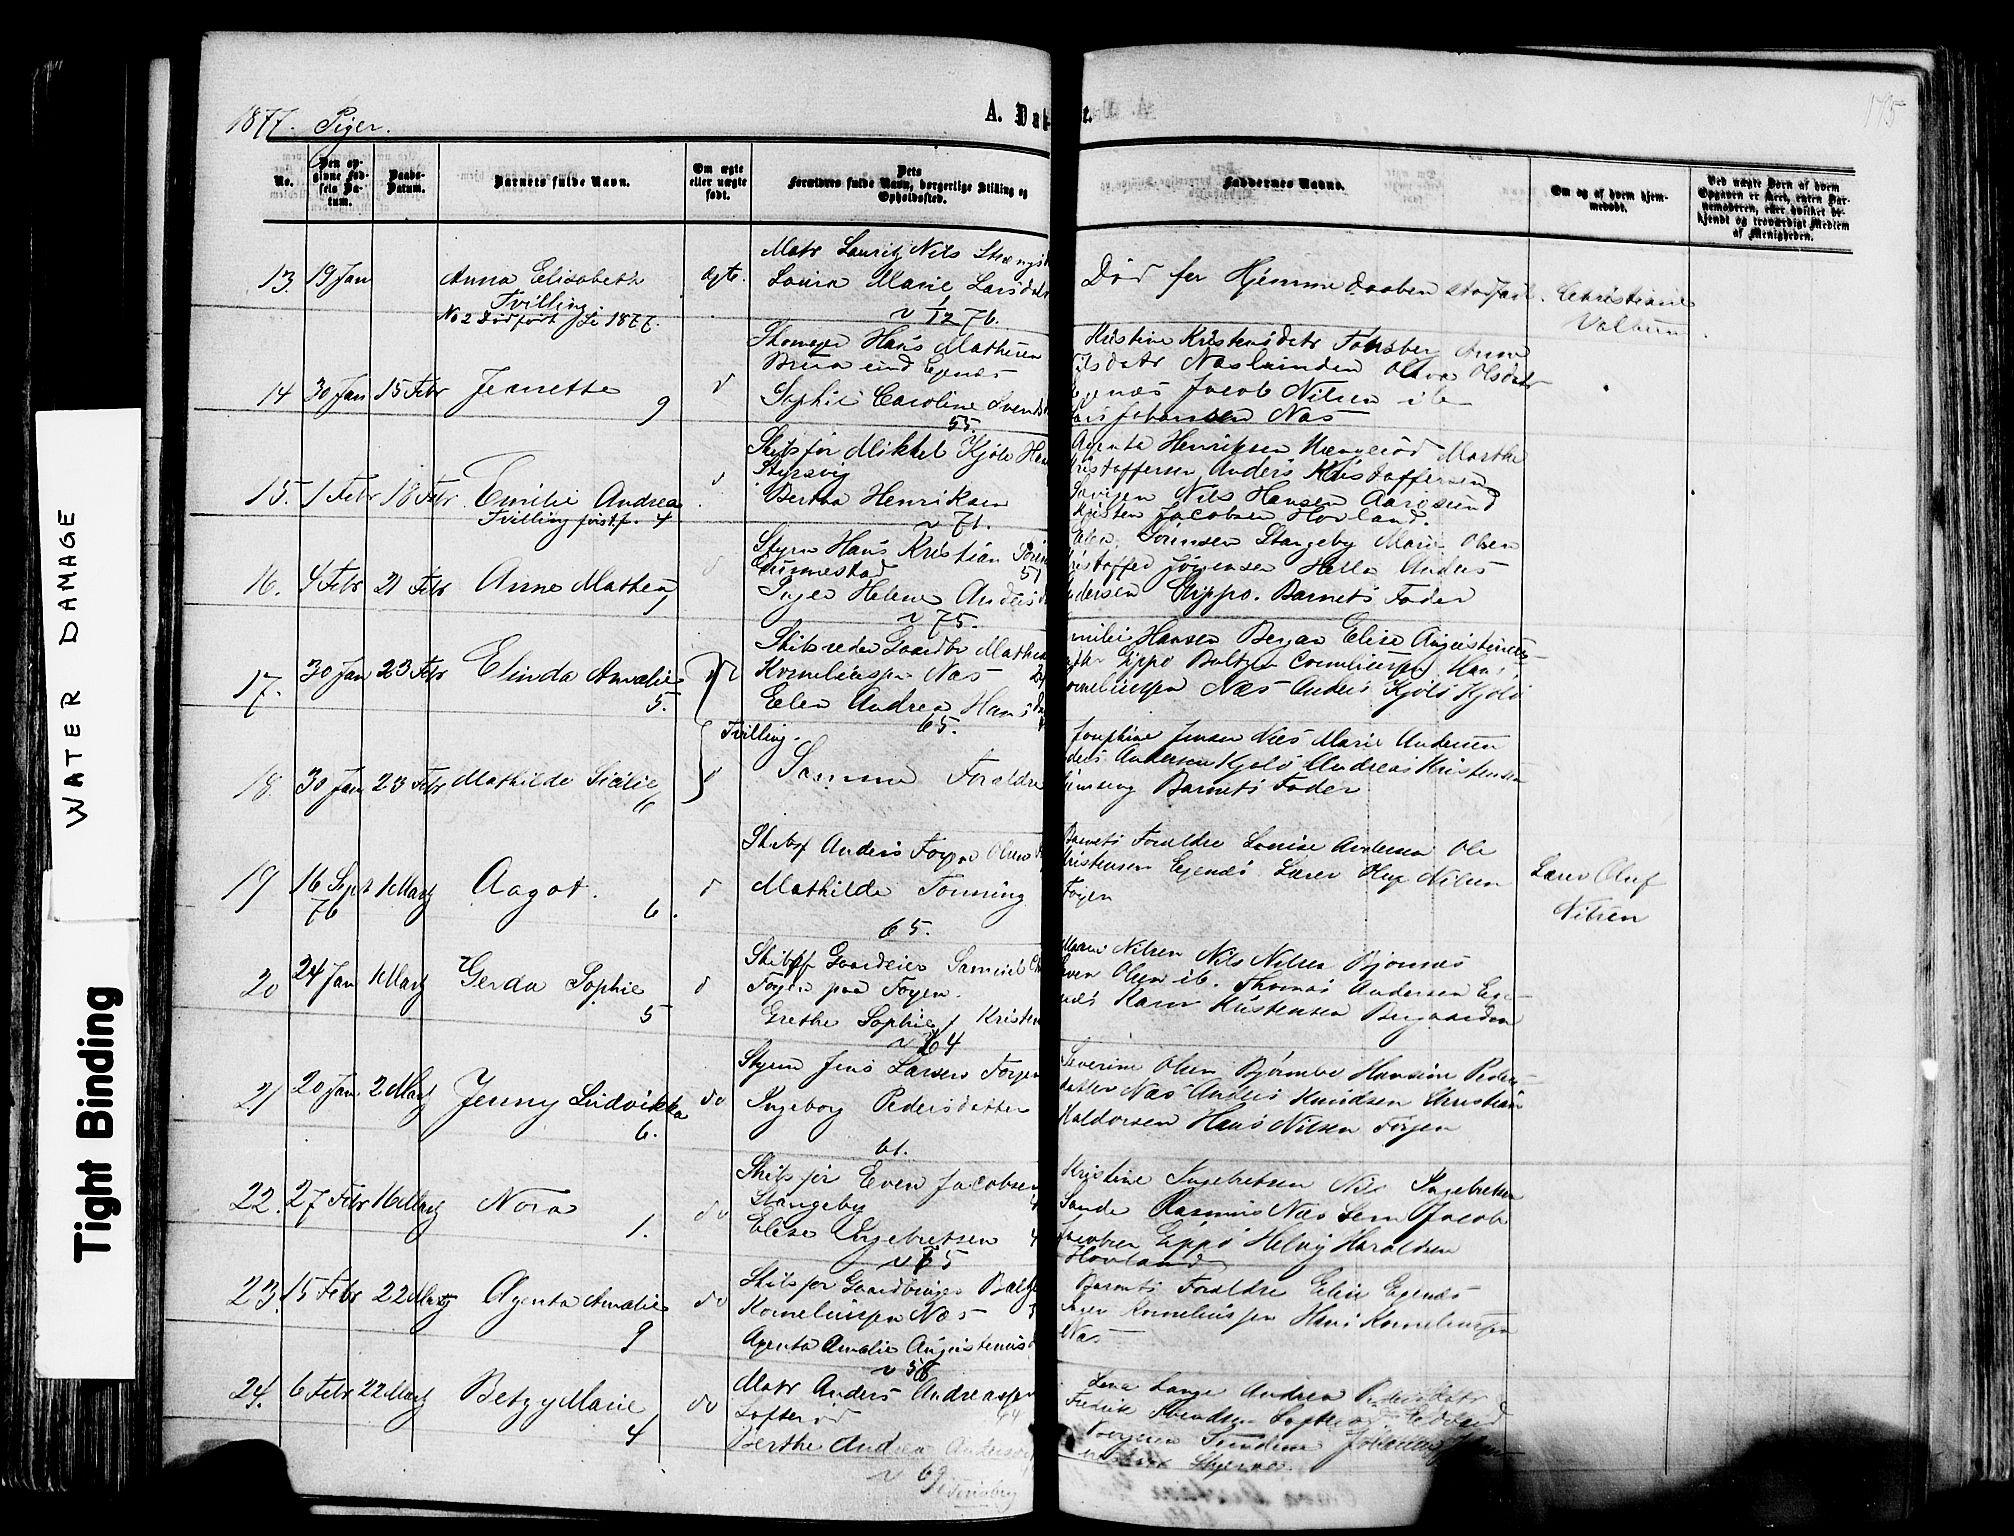 SAKO, Nøtterøy kirkebøker, F/Fa/L0007: Ministerialbok nr. I 7, 1865-1877, s. 175